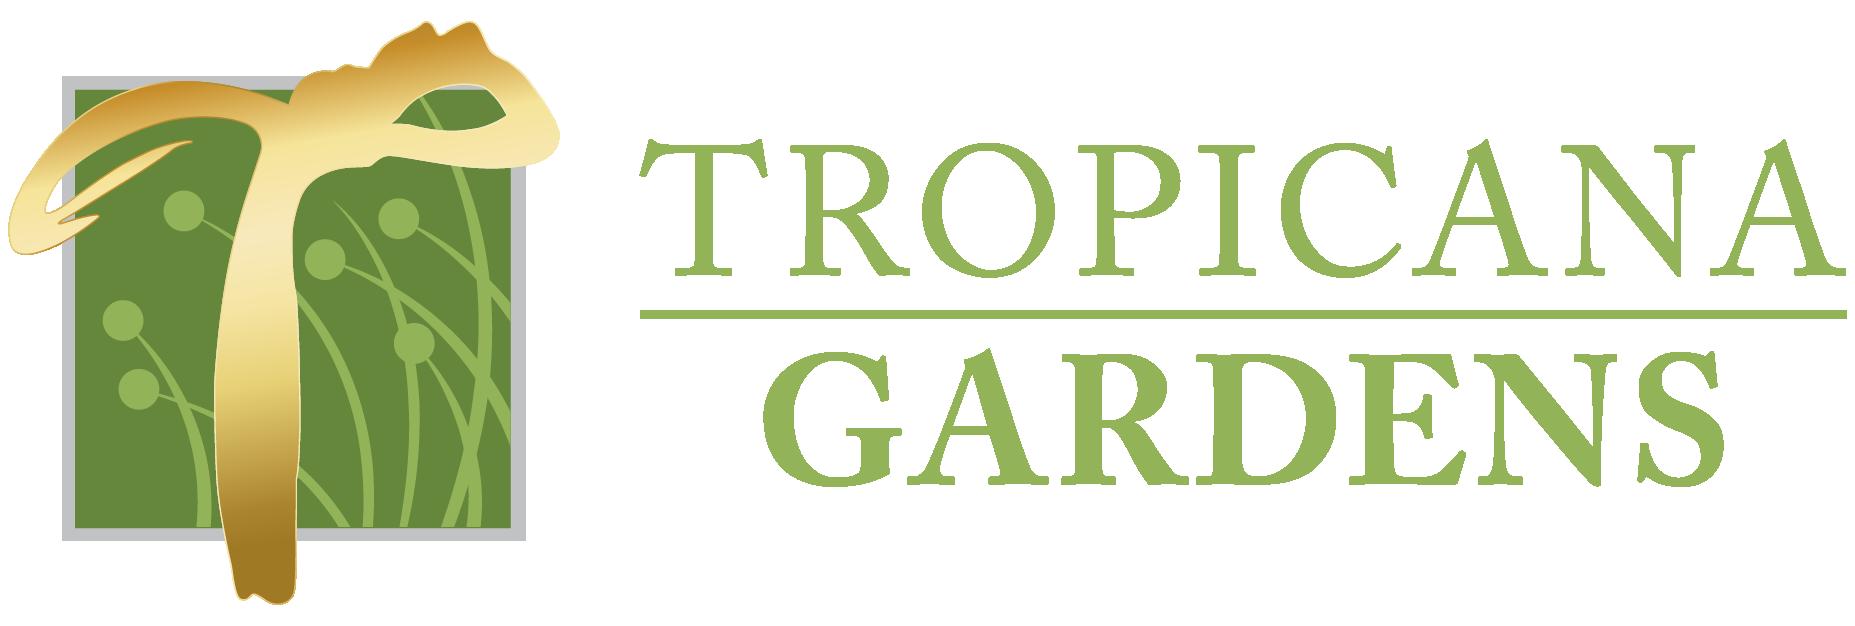 Tropicana Gardens Mall Logo